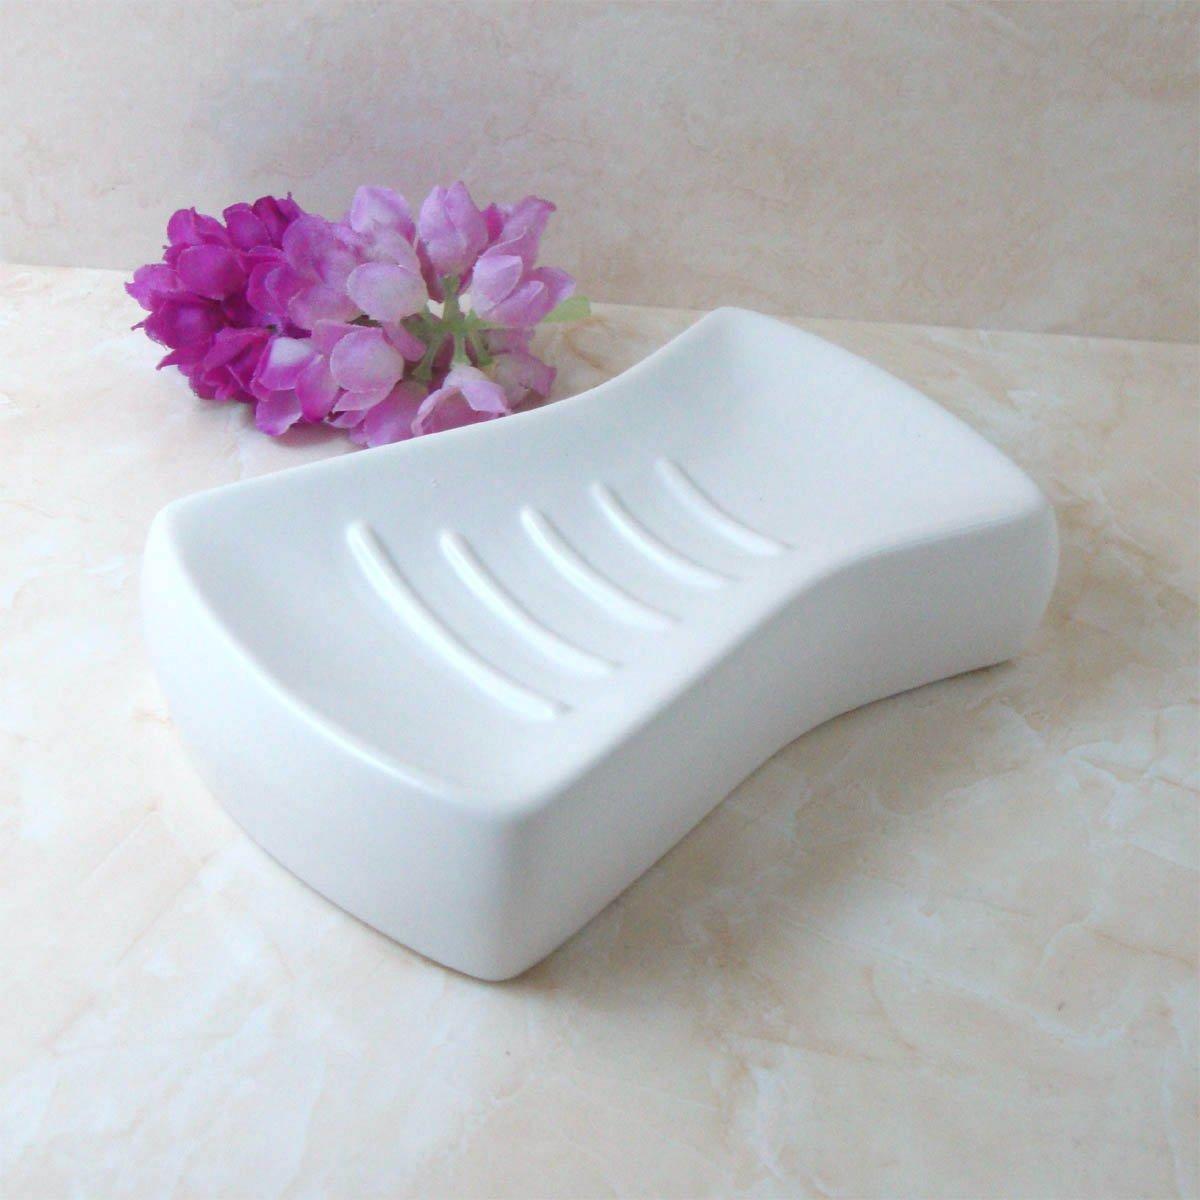 GTVERNH-Ceramic Soap Box Dish Soap Laundry Soap Pure White Amitsu Soap Rack Simple High-Grade Rectangular Handmade Soap Dish